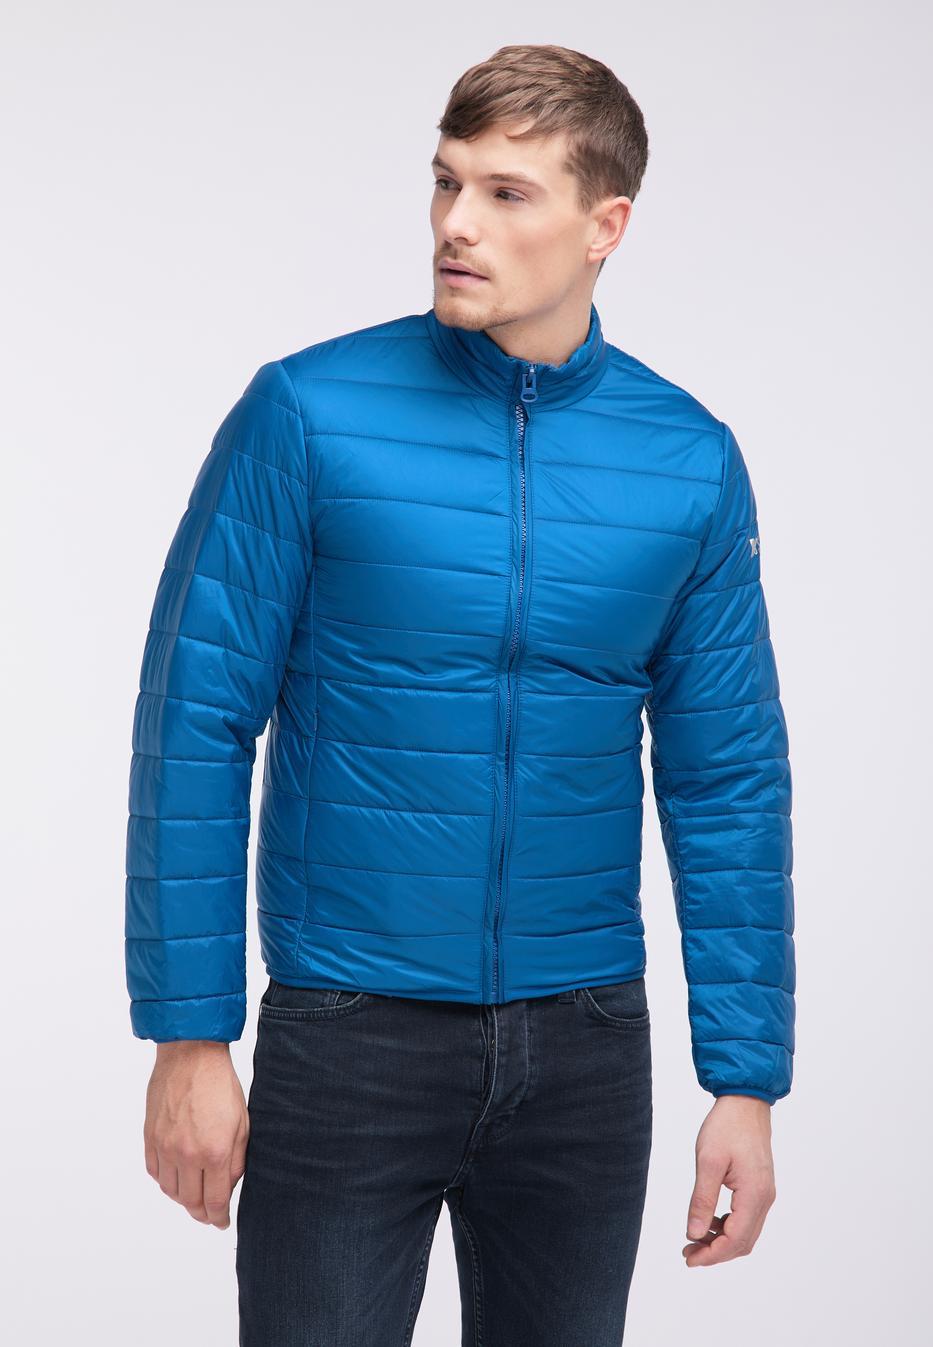 Куртка MUSTANG Padded Jacket куртка mustang padded jacket